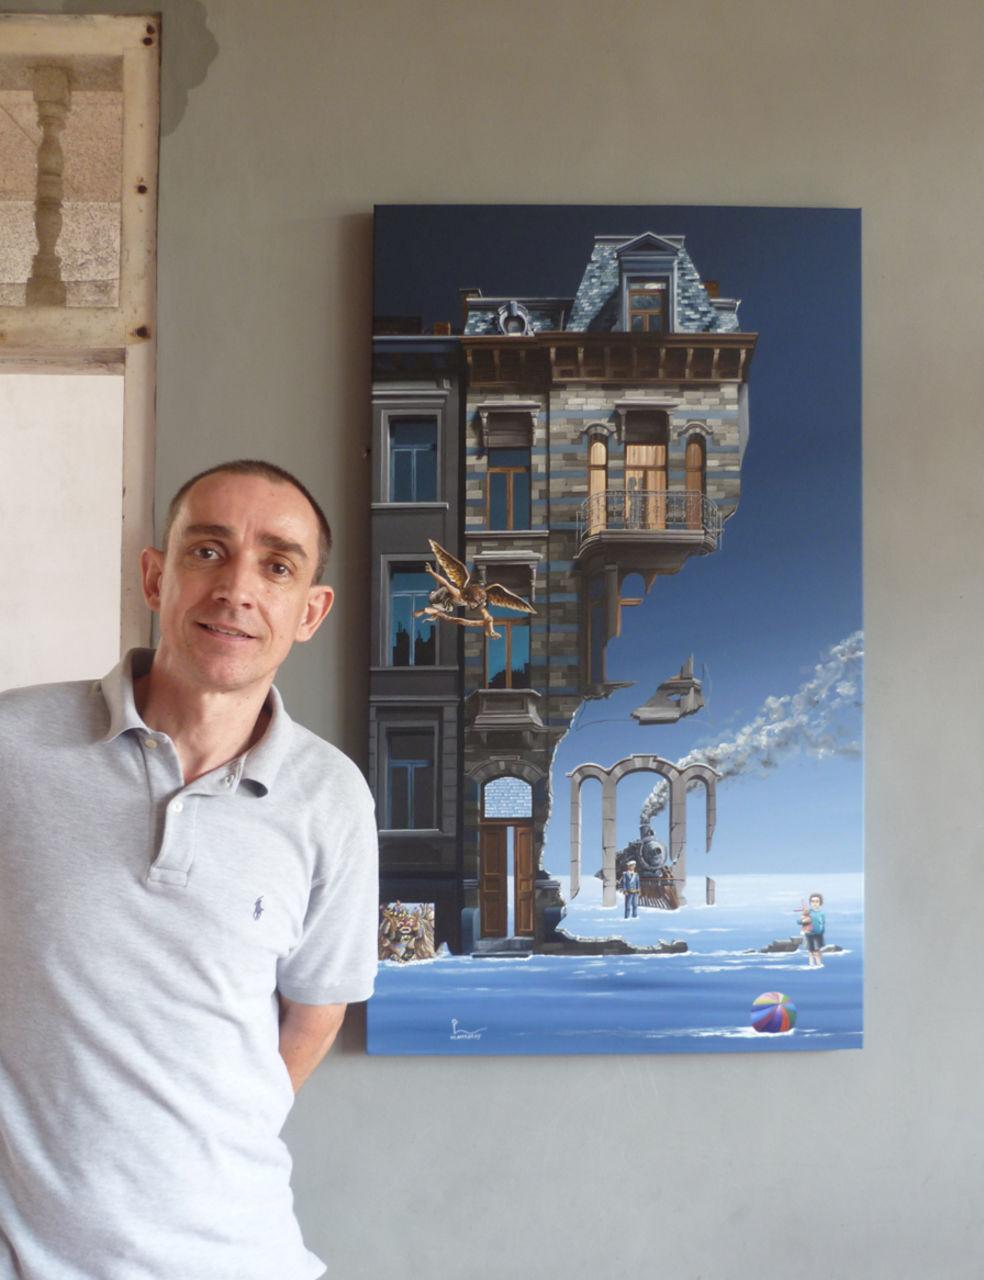 olivier lamboray the artist & his painting